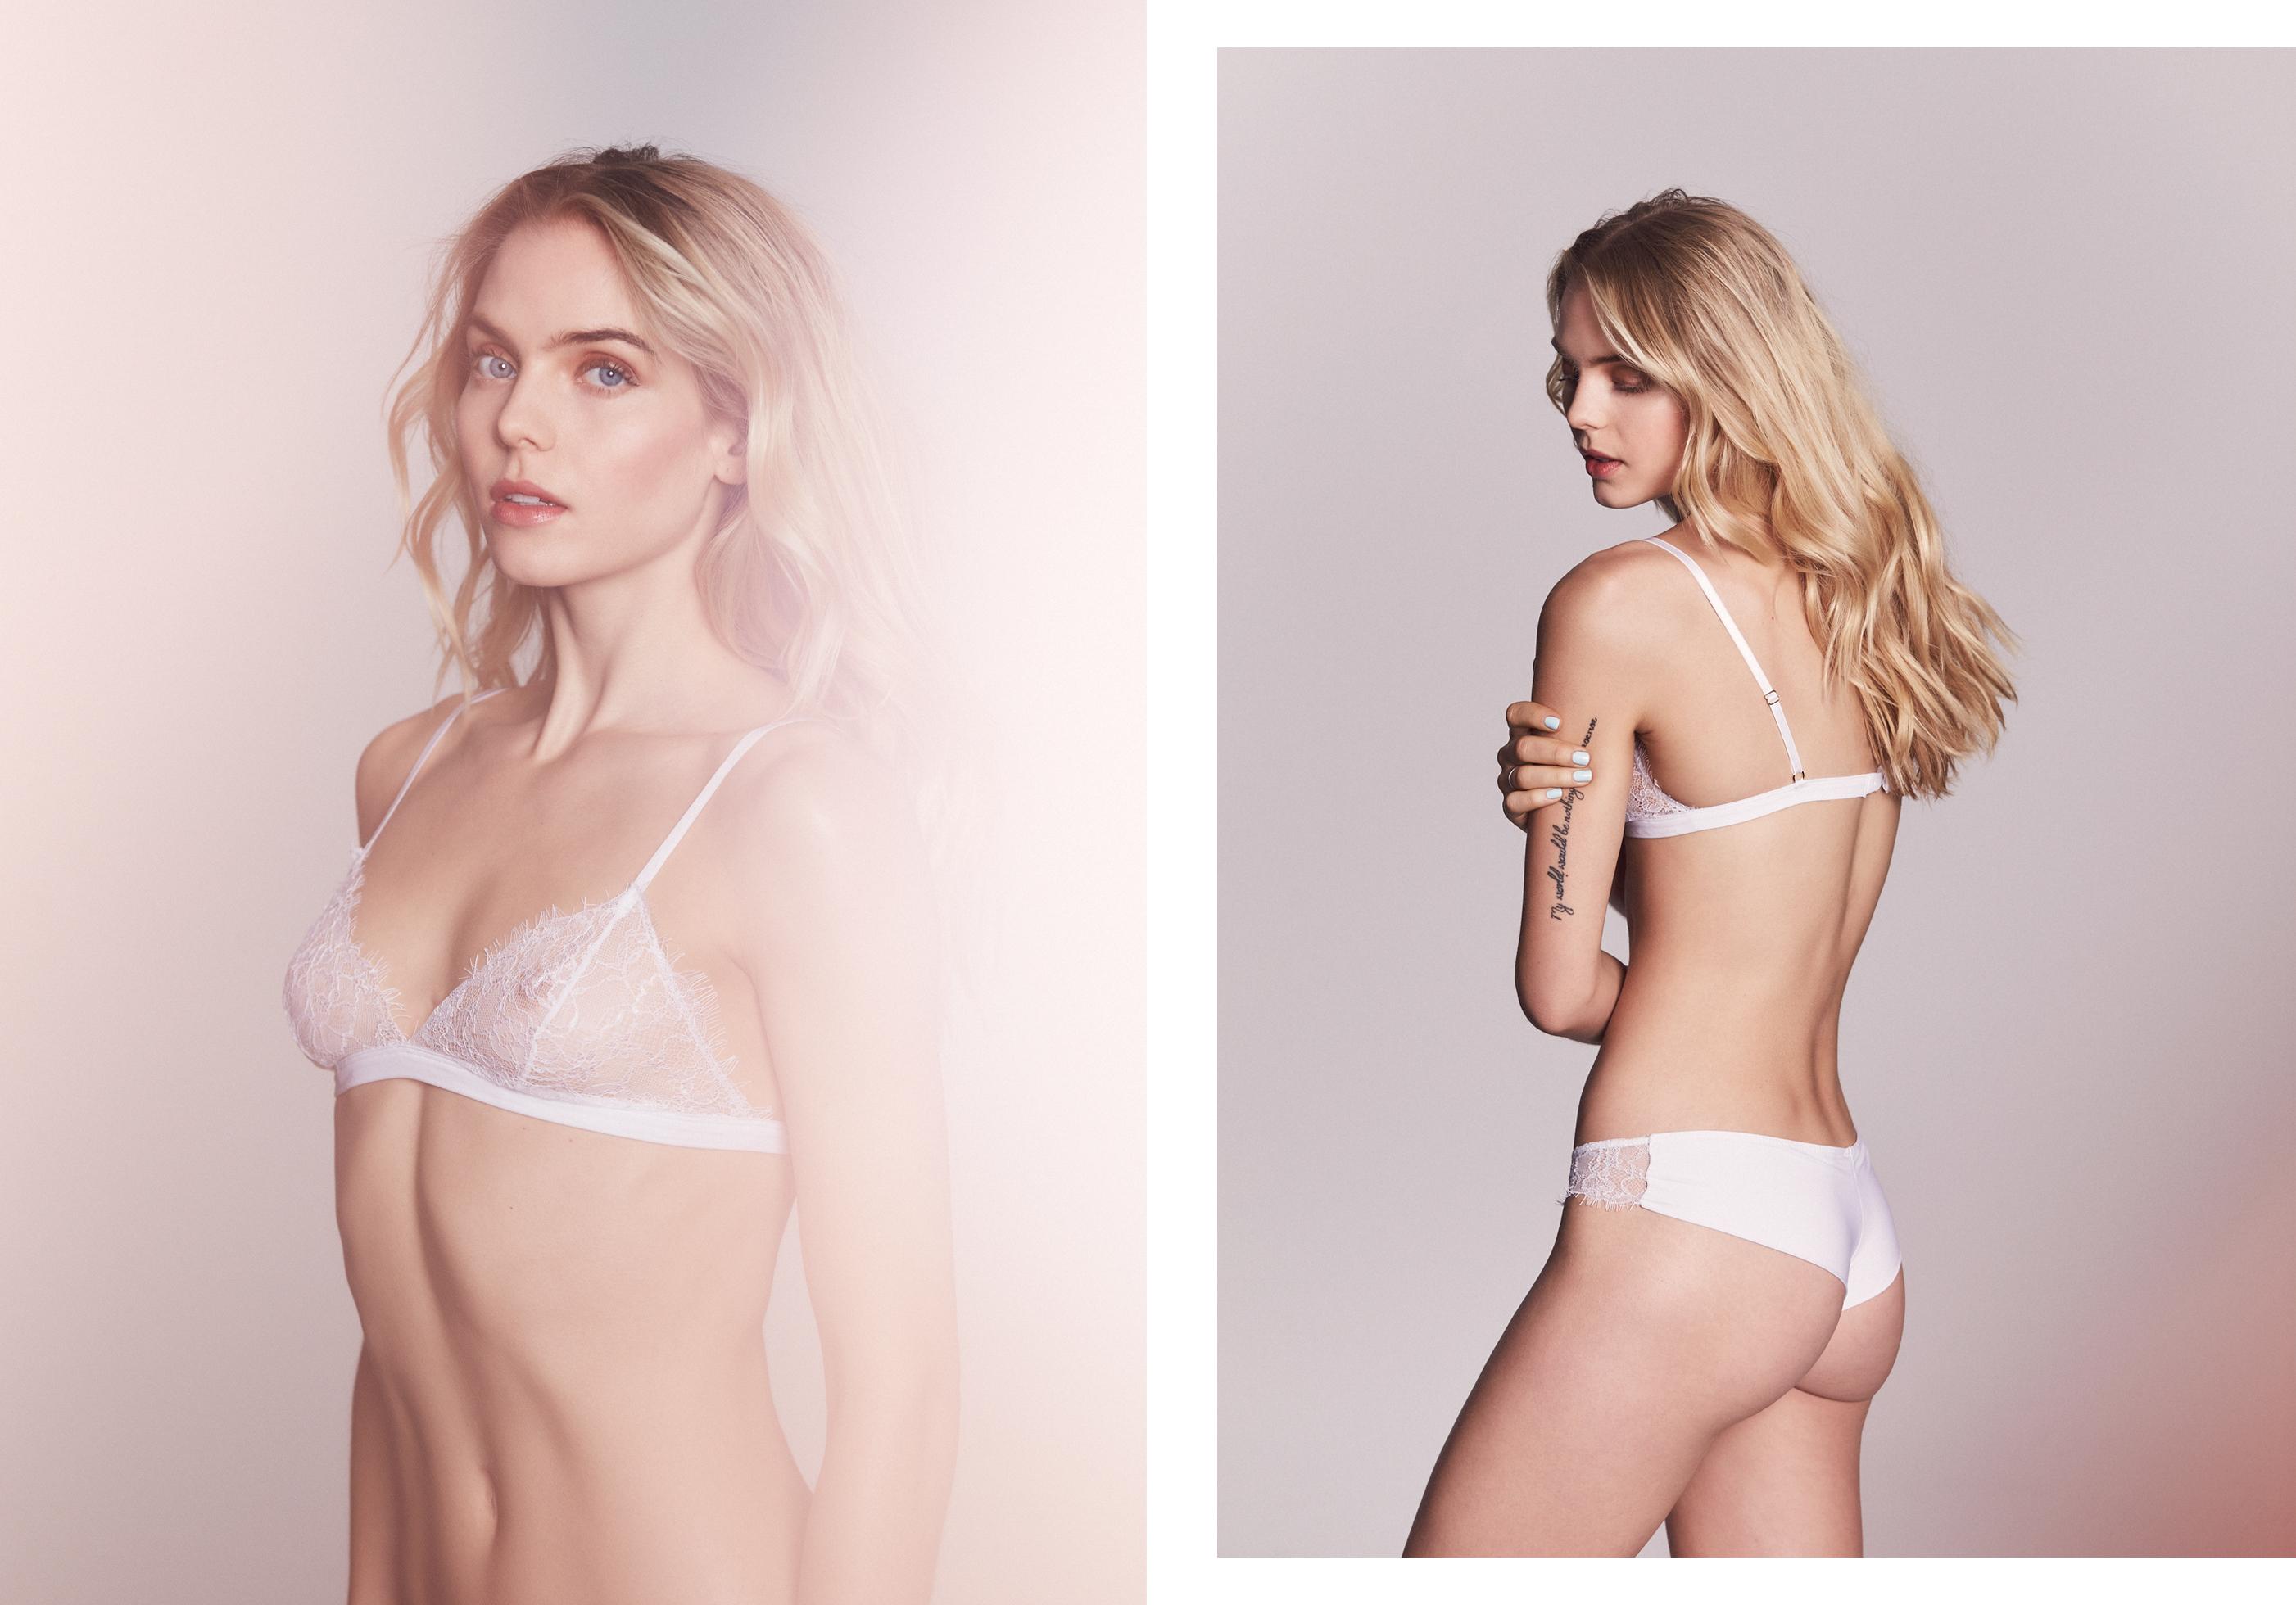 Elisabetta canalis naked Erotic nude OOPS Damaris Lewis,Cristina del pin laura biagiotti show in milan